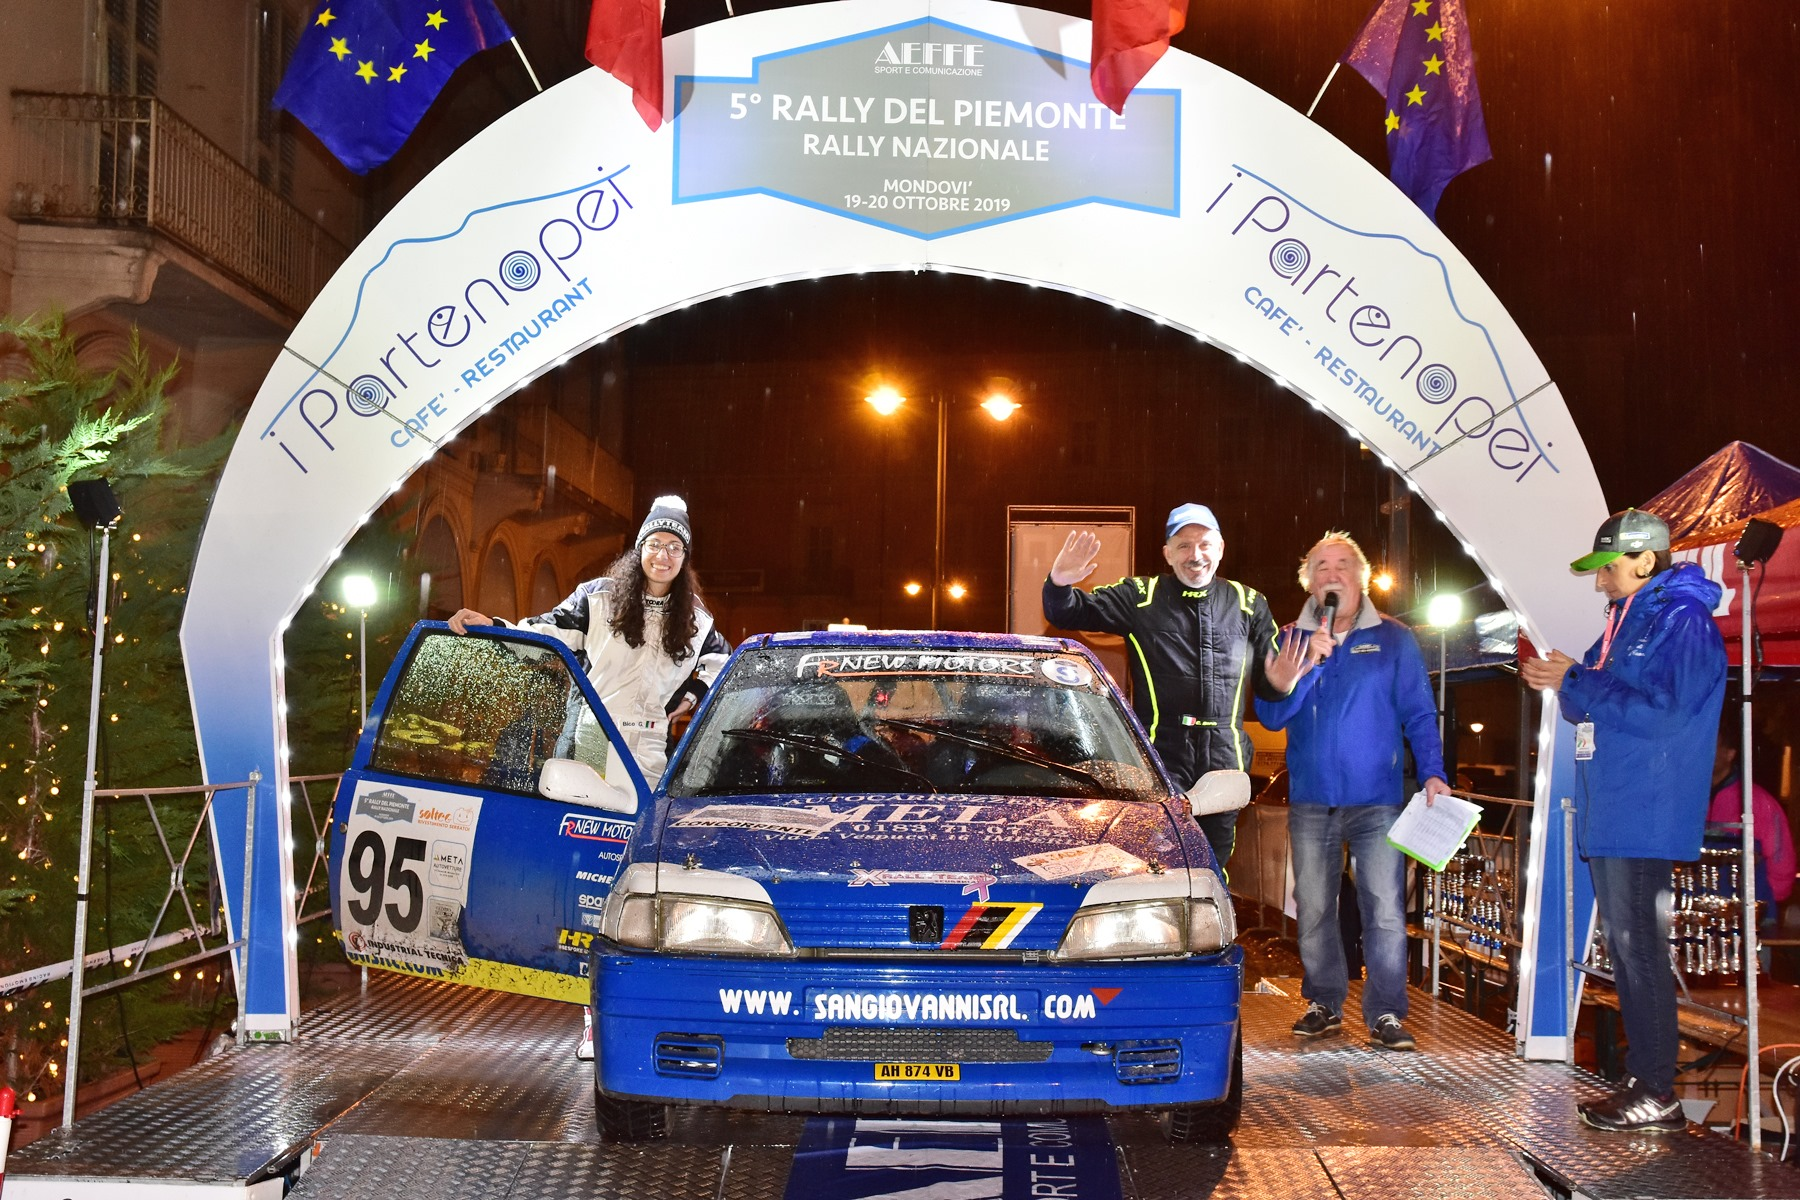 rally Piemonte 19